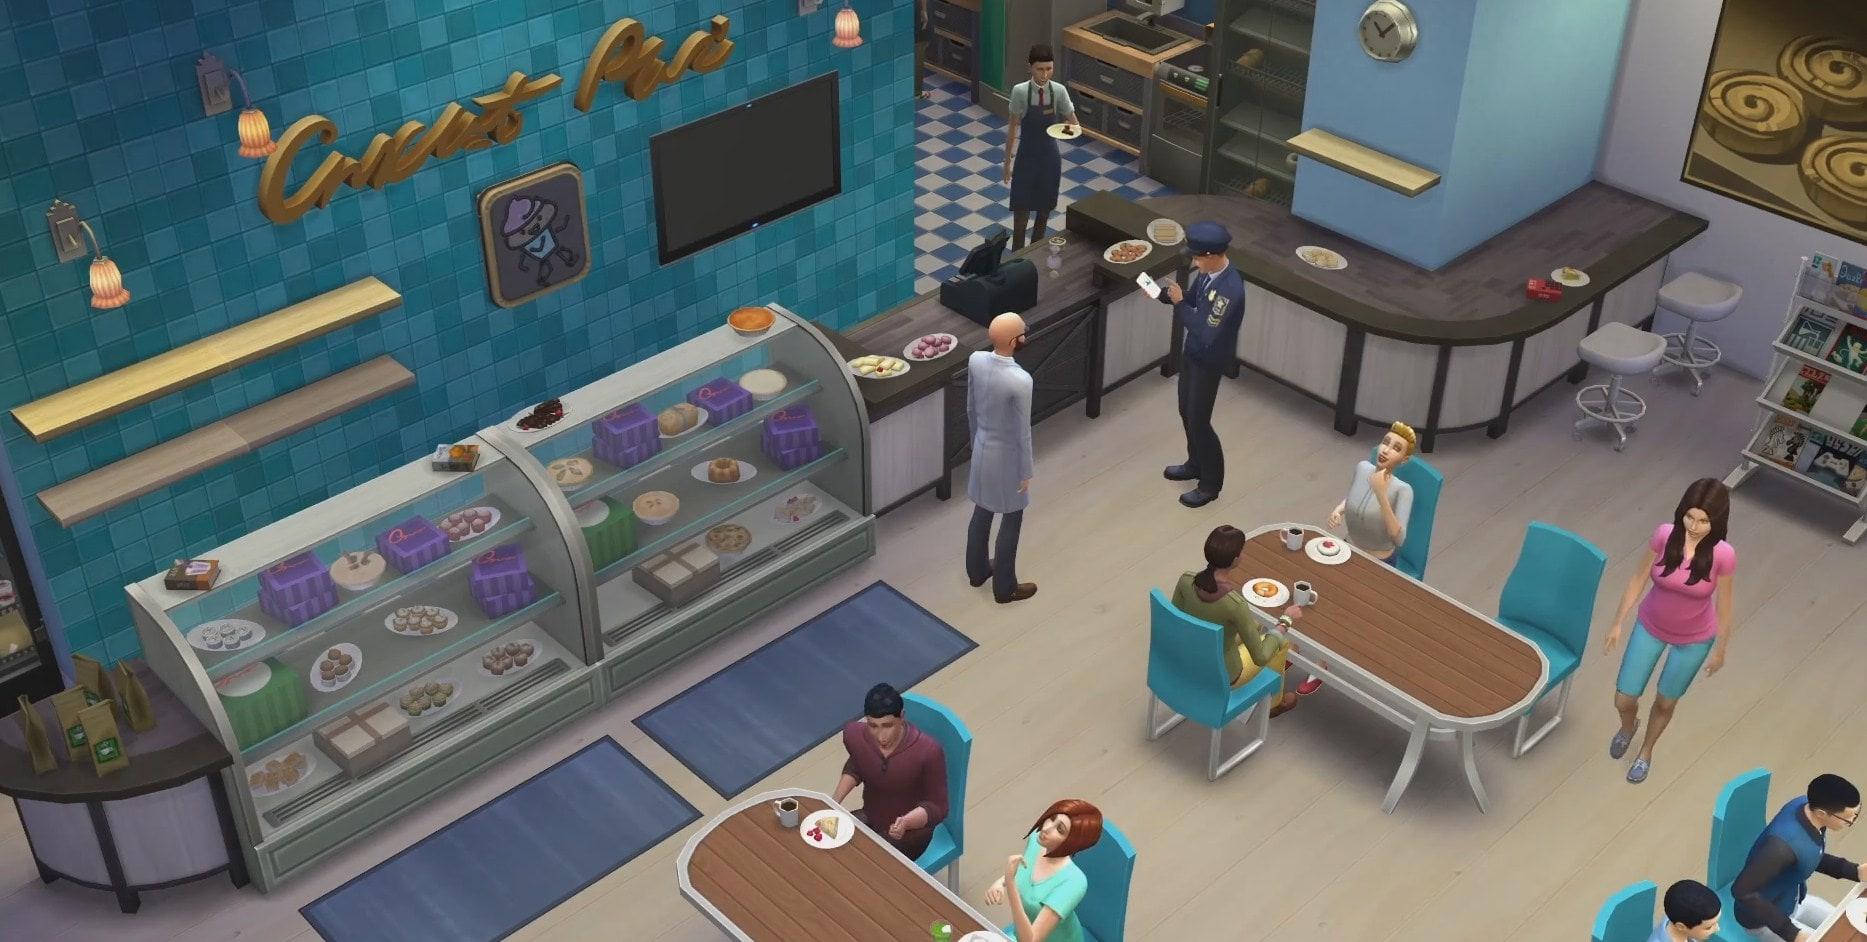 Les Sims 4: Au travail!